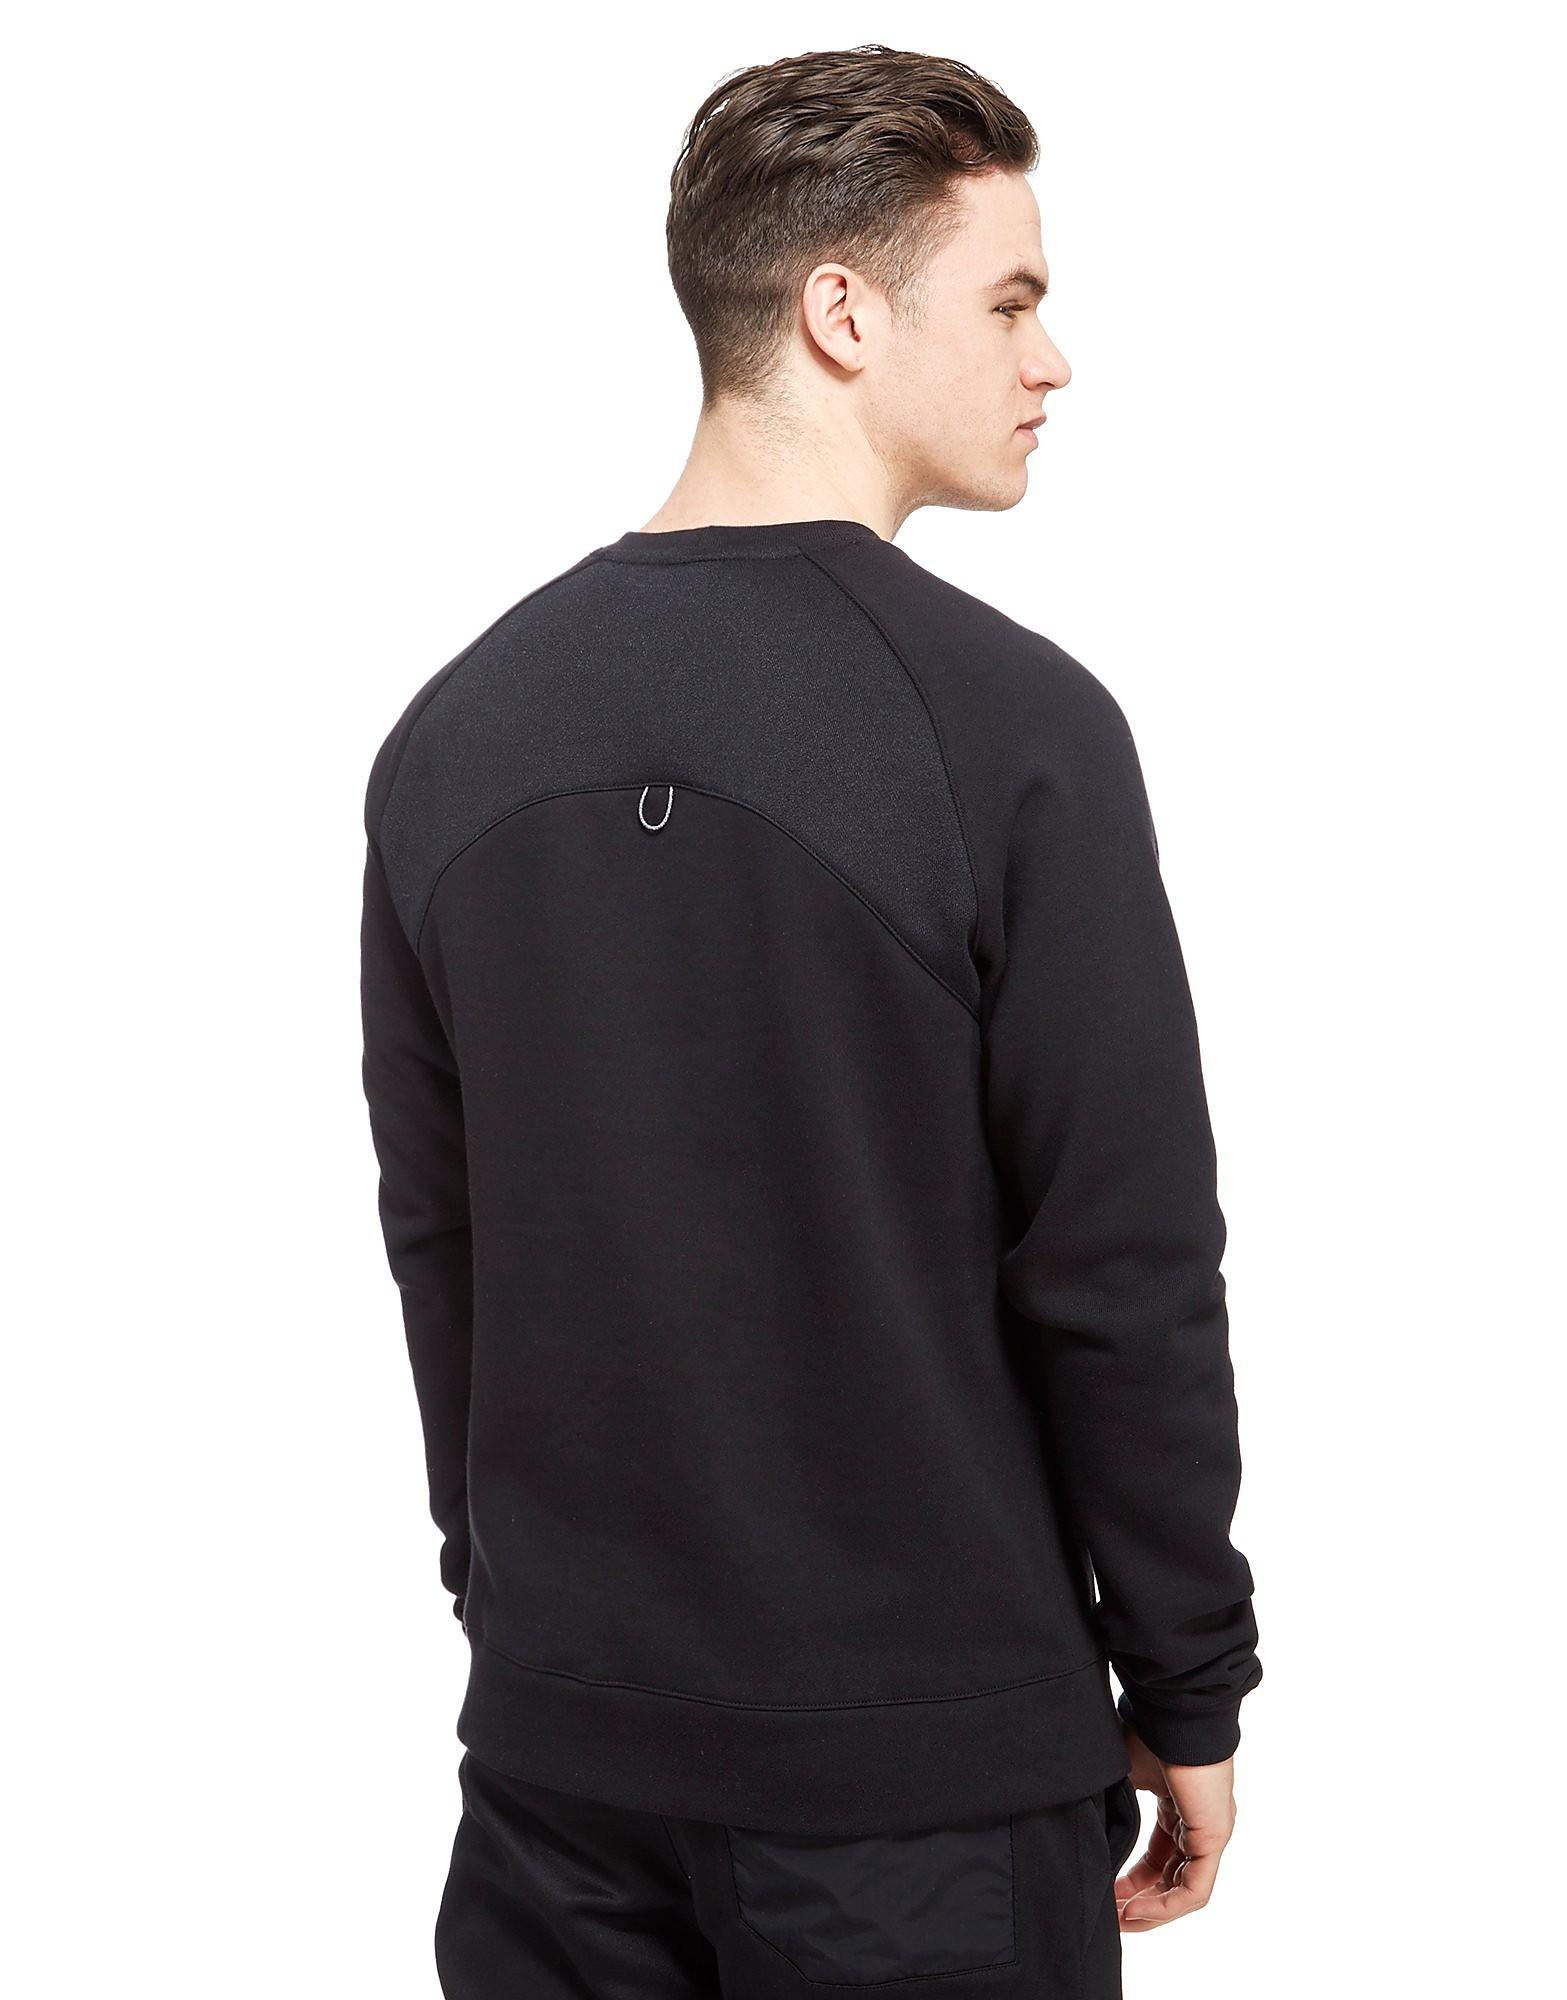 Nike Air Hybrid Crew Sweatshirt